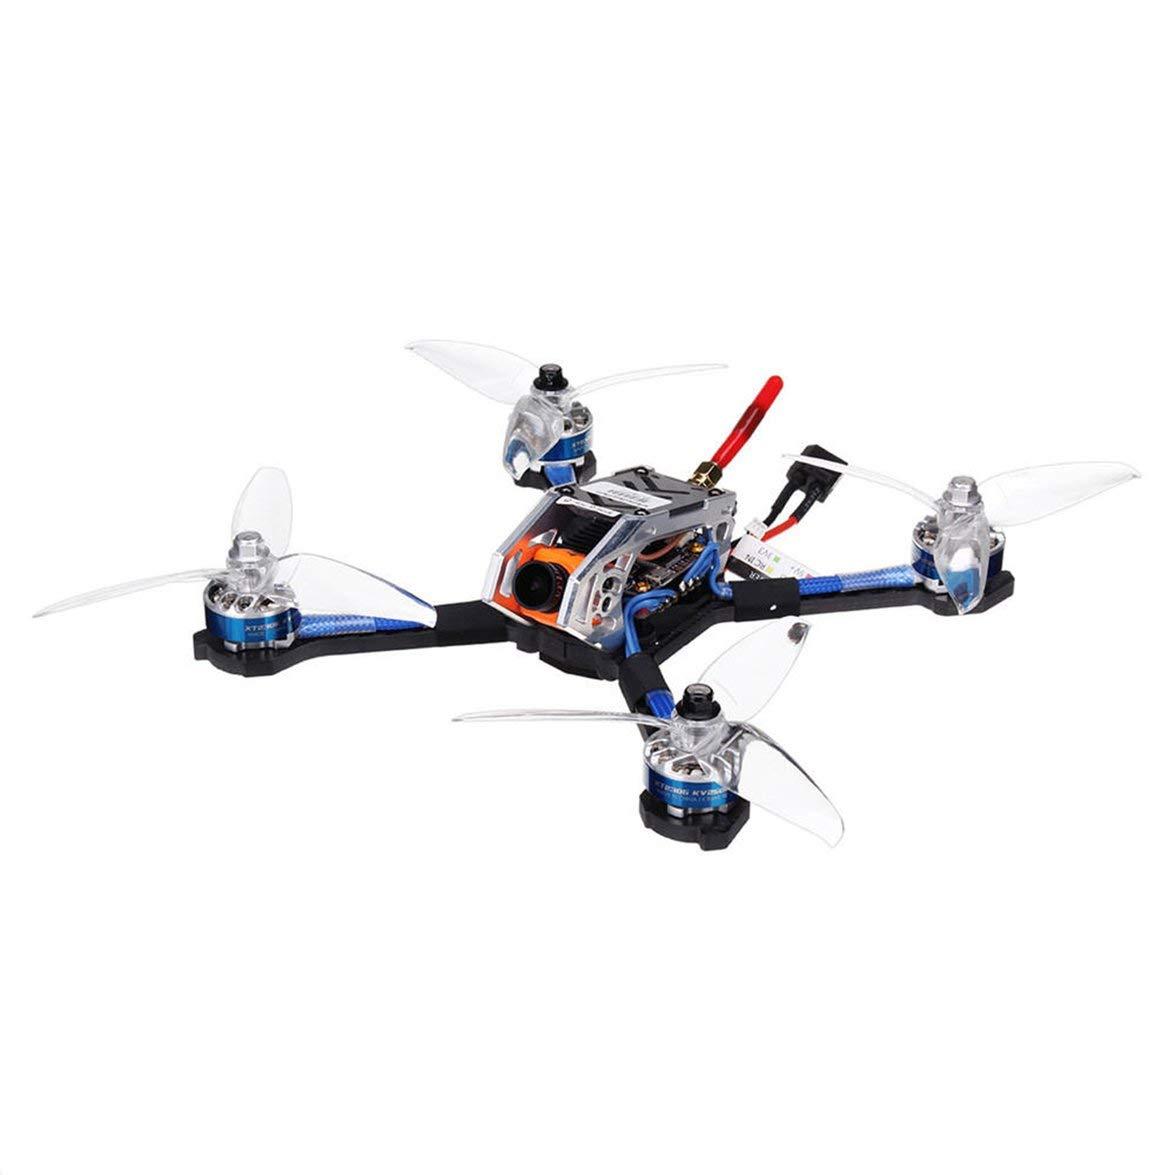 Kongqiabona LDARC KK Drohne FPV Drohne RC Quadcopter RC Racing Drohne Hochgeschwindigkeitsdrohne 800TVL Kamera Drohne Echtzeit Drohne OSD Drohne